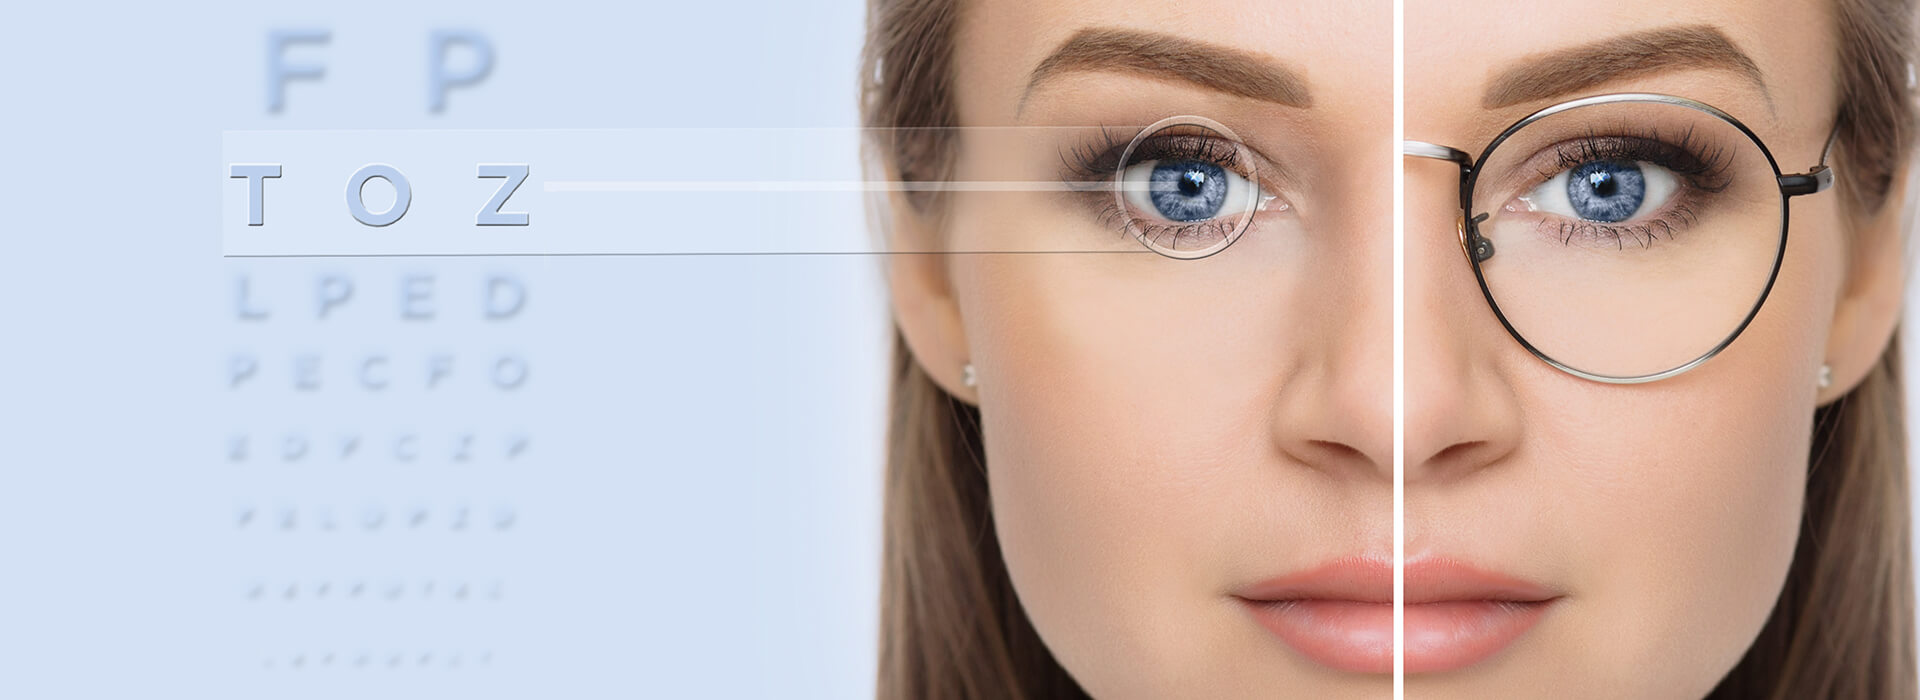 Centro de cirurgia a laser de miopia catarata astigmatismo cirurgia refrativa e cirurgia plastica dos olhos.jpg.jpeg